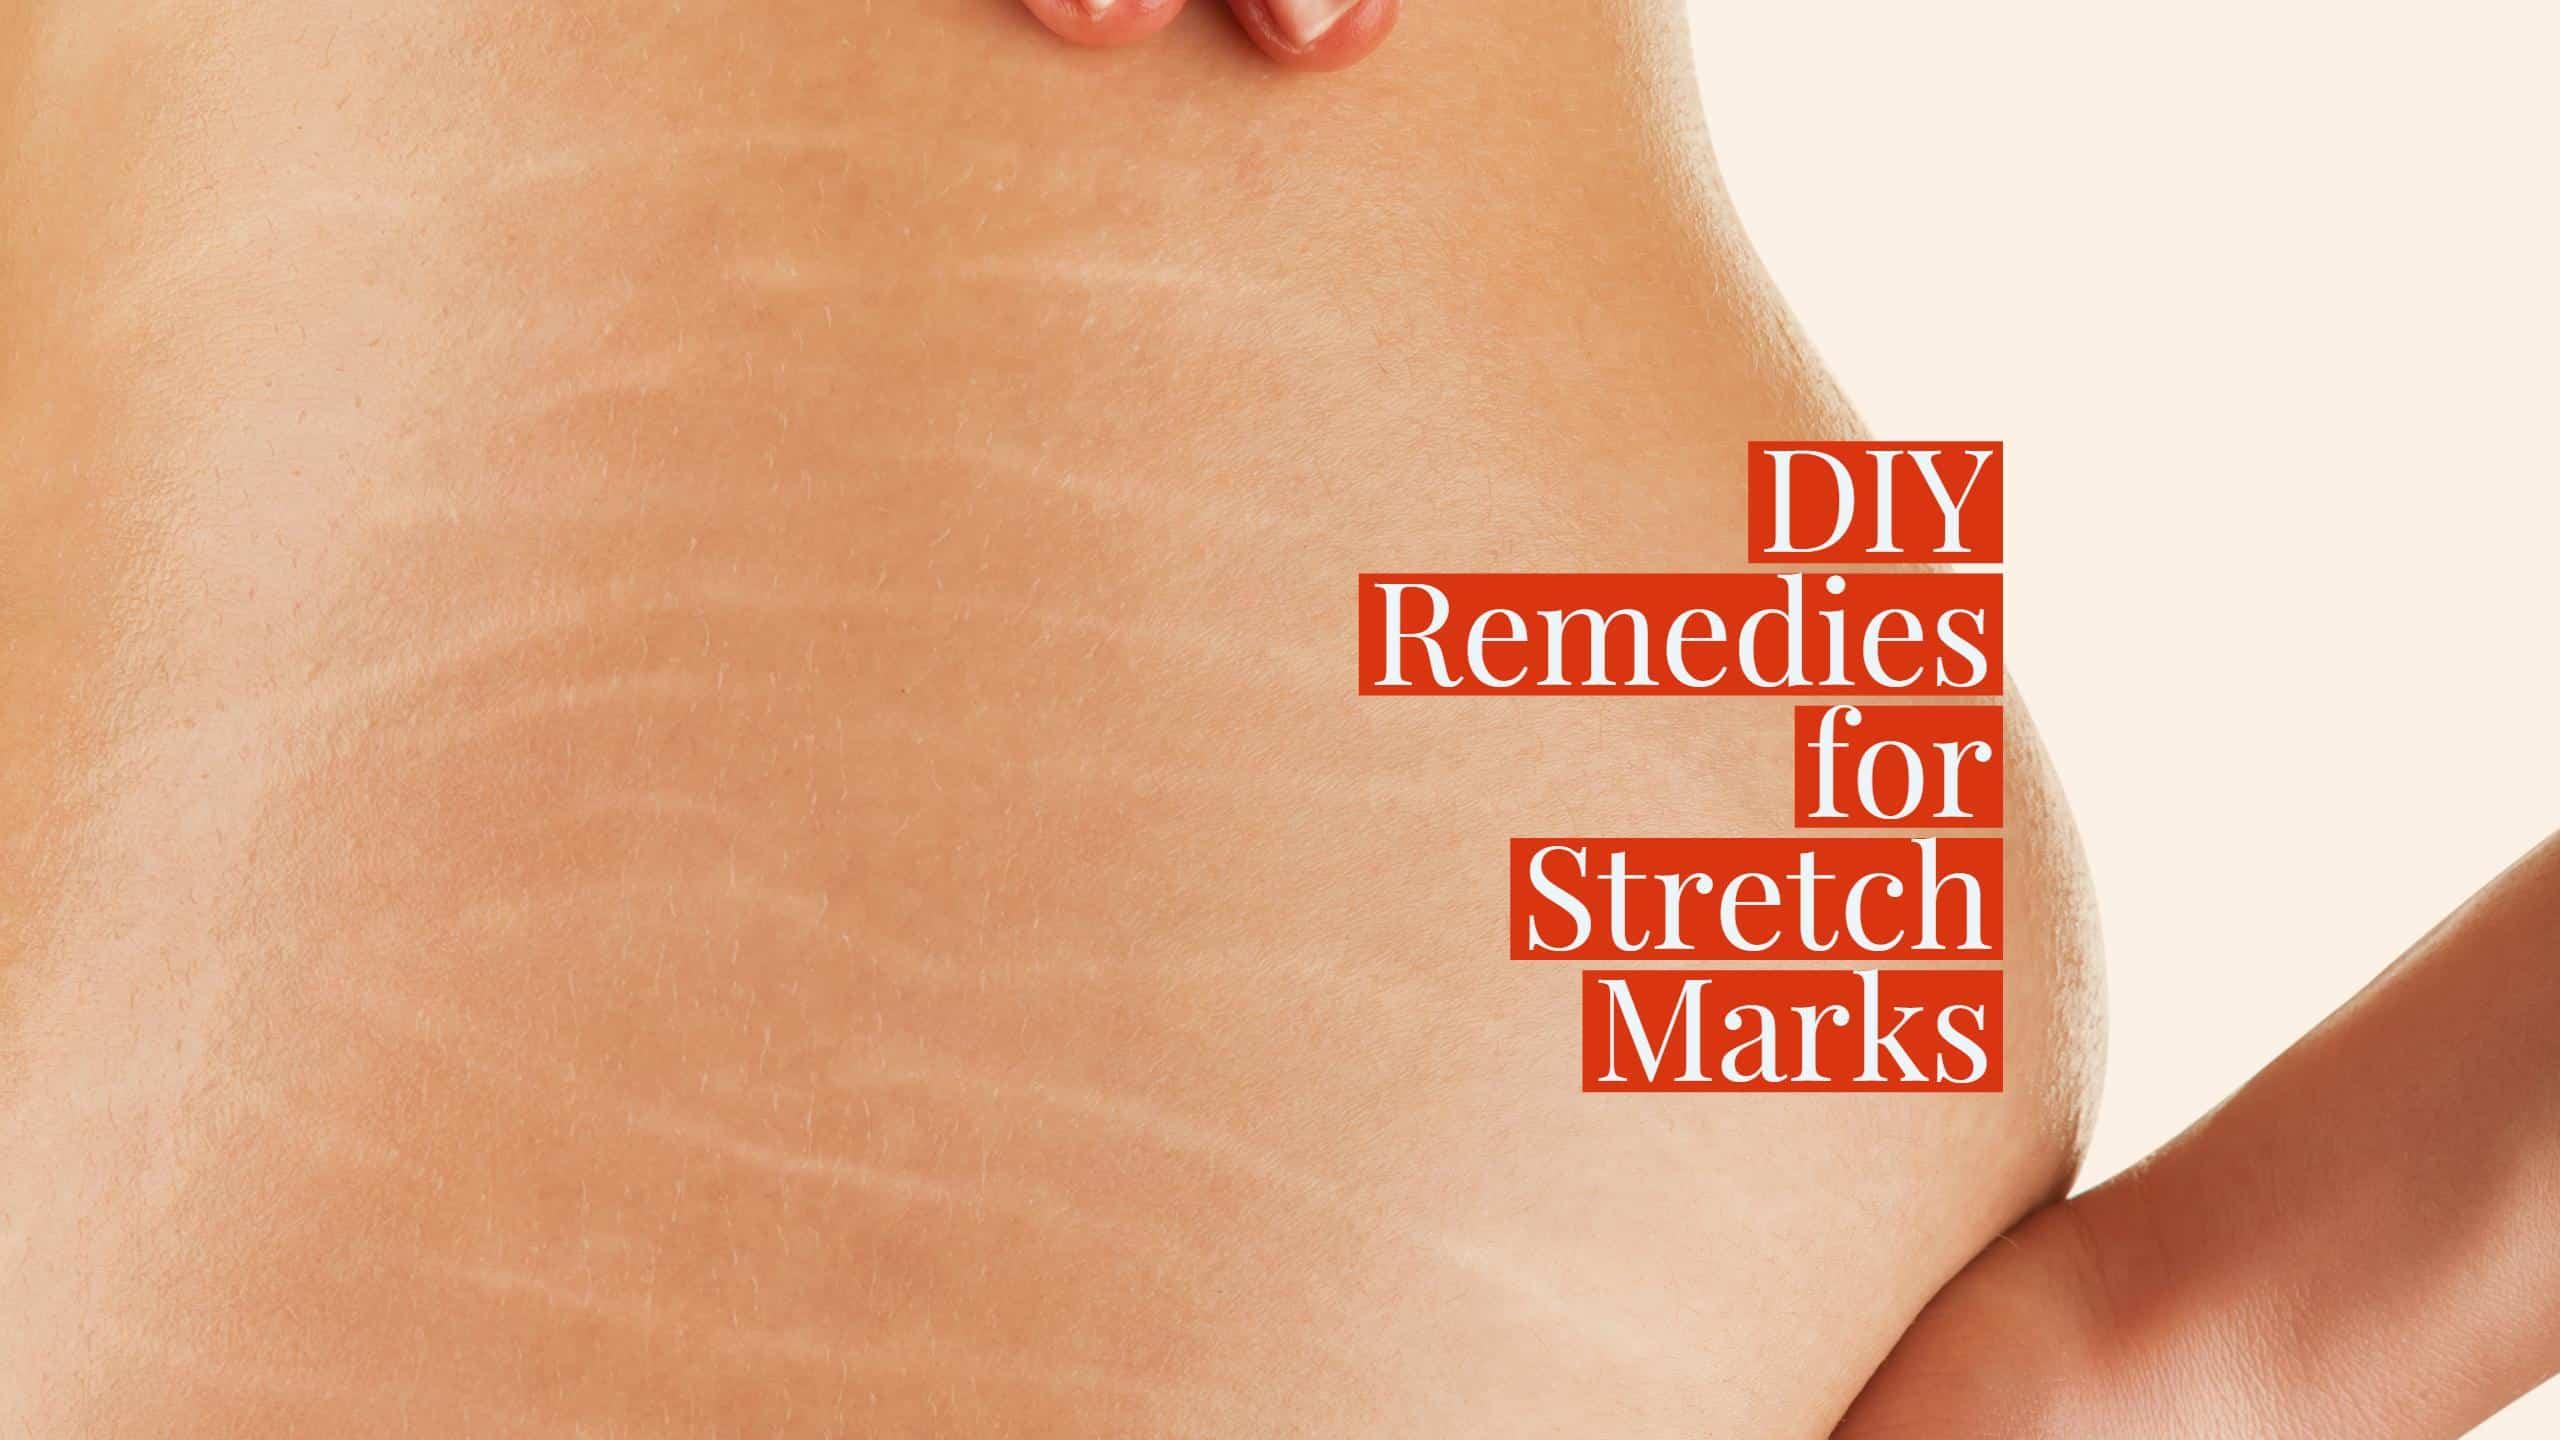 DIY Remedies for Stretch-Marks